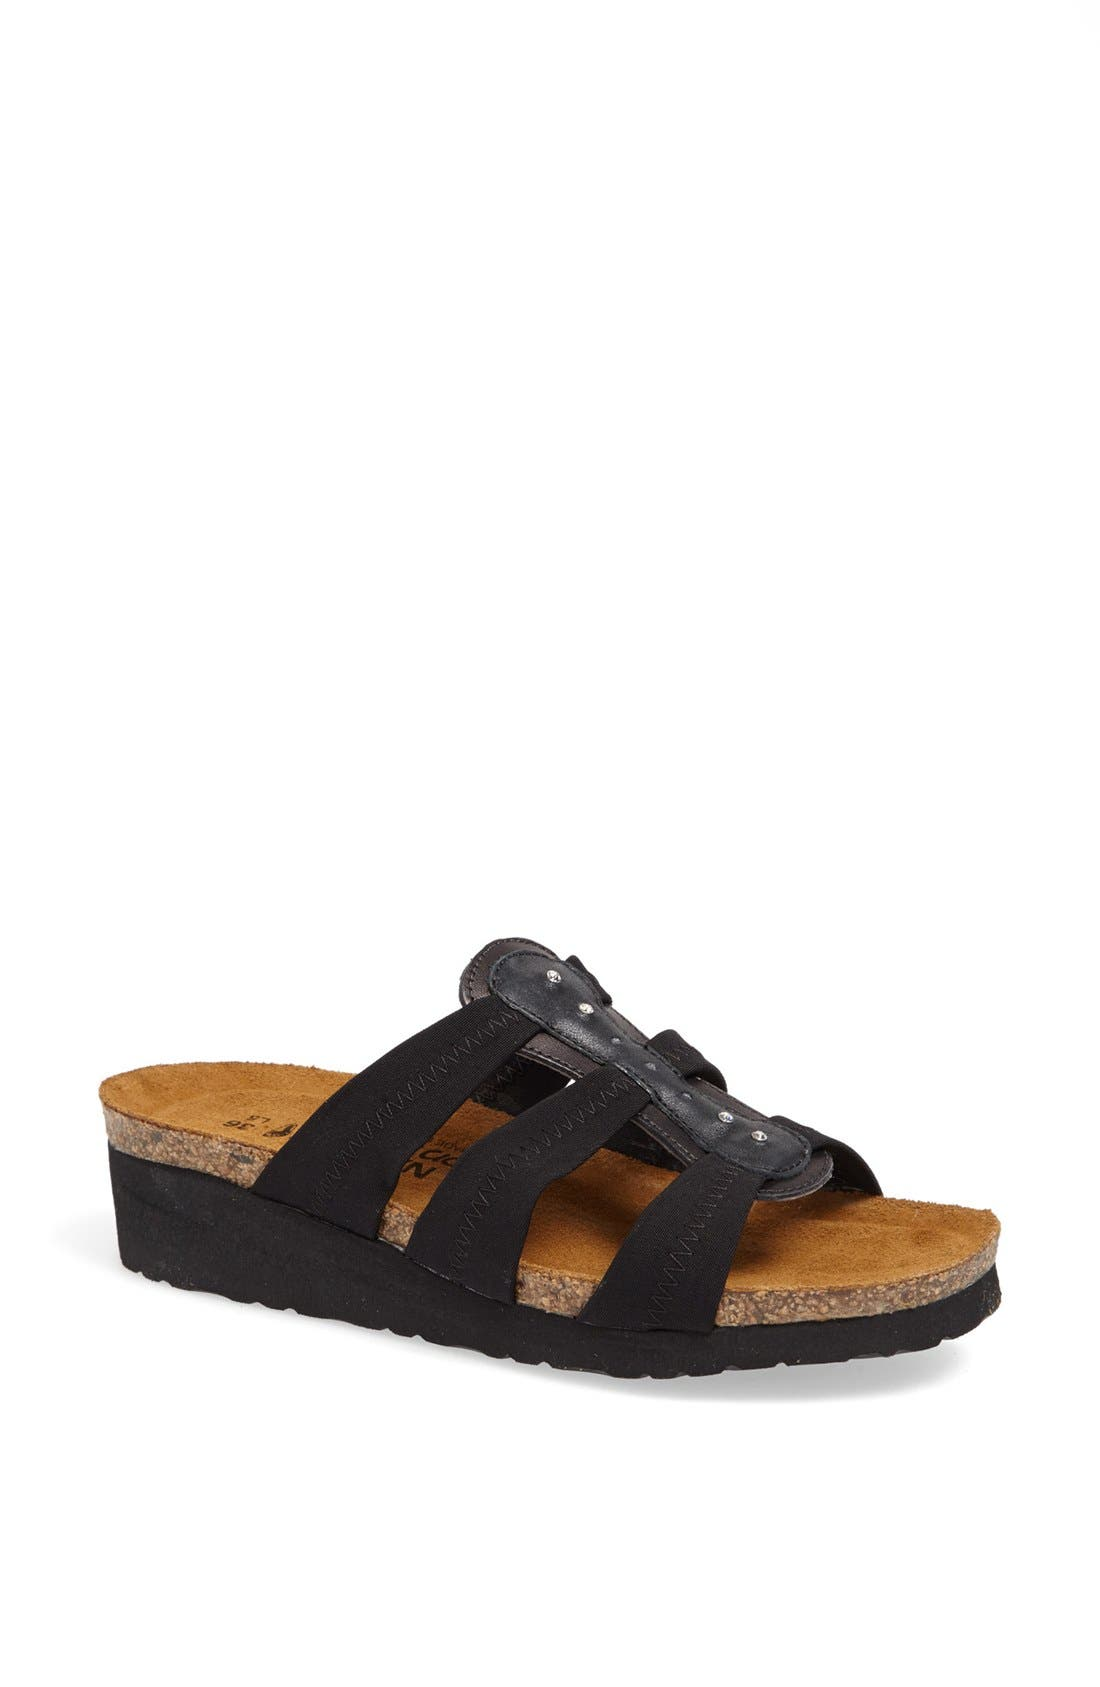 Alternate Image 1 Selected - Naot 'Brooke' Sandal